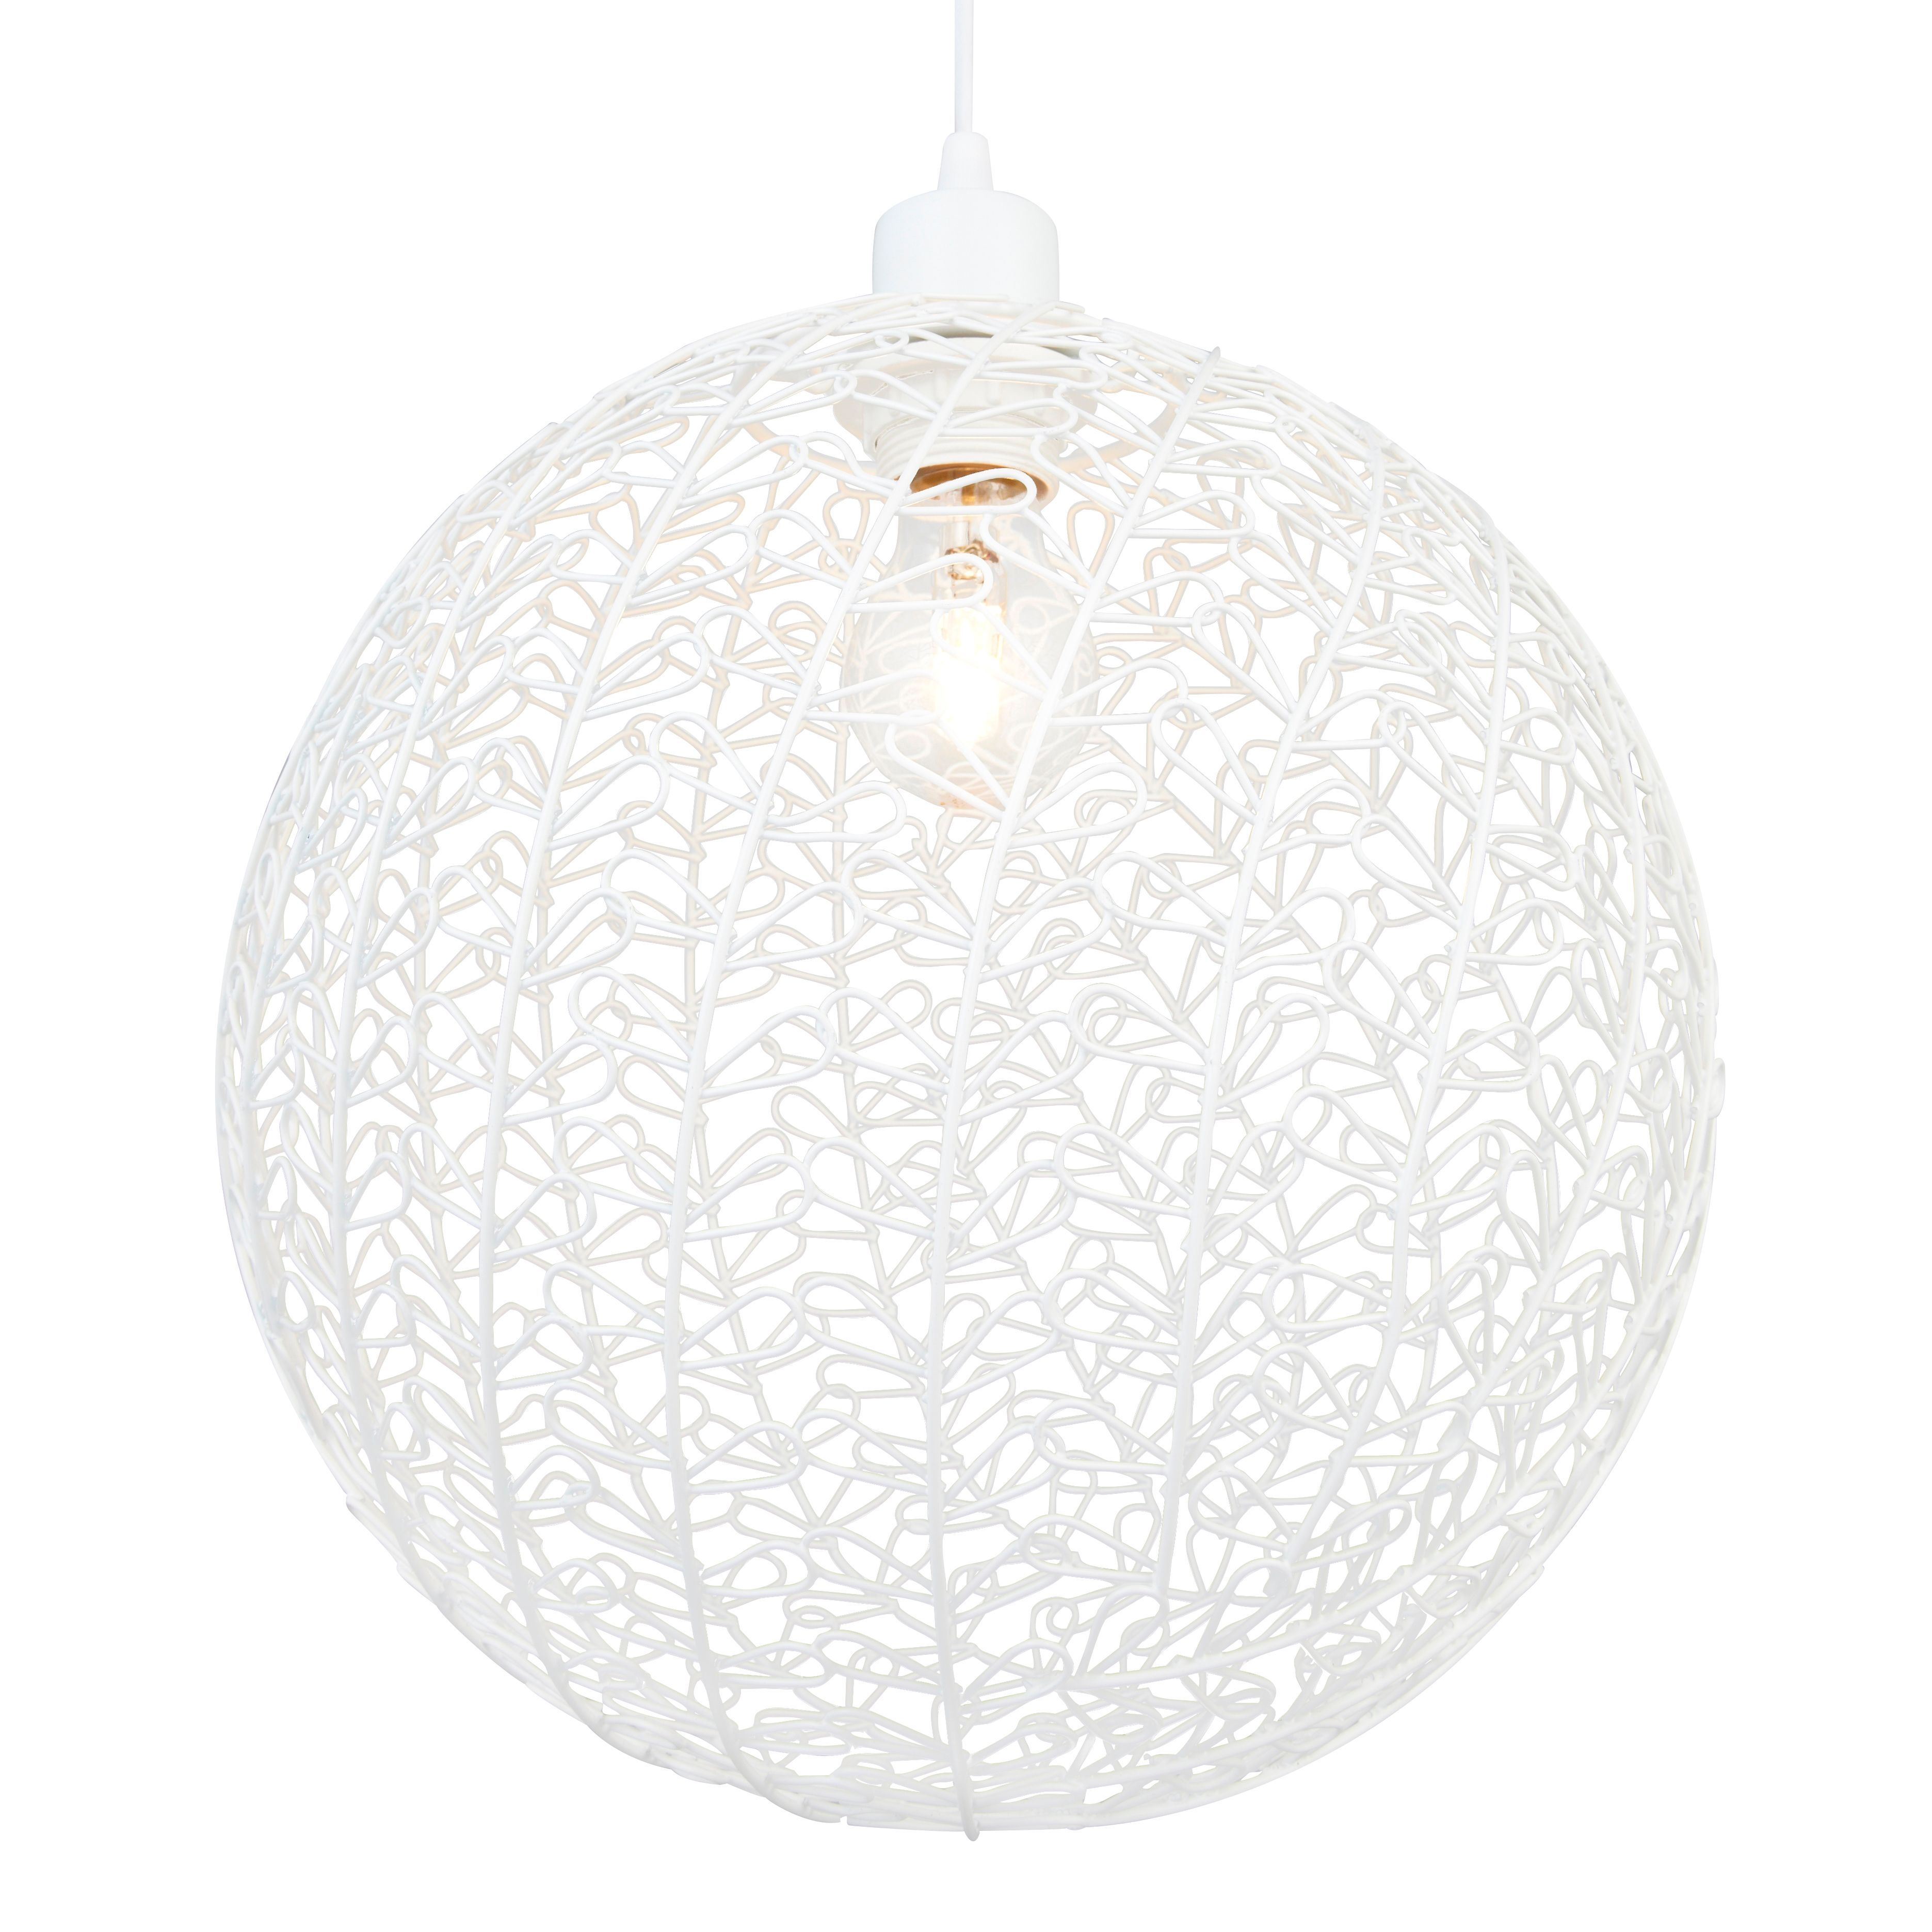 Colours Missoula White Matt Wire Ball Light Shade D 30cm